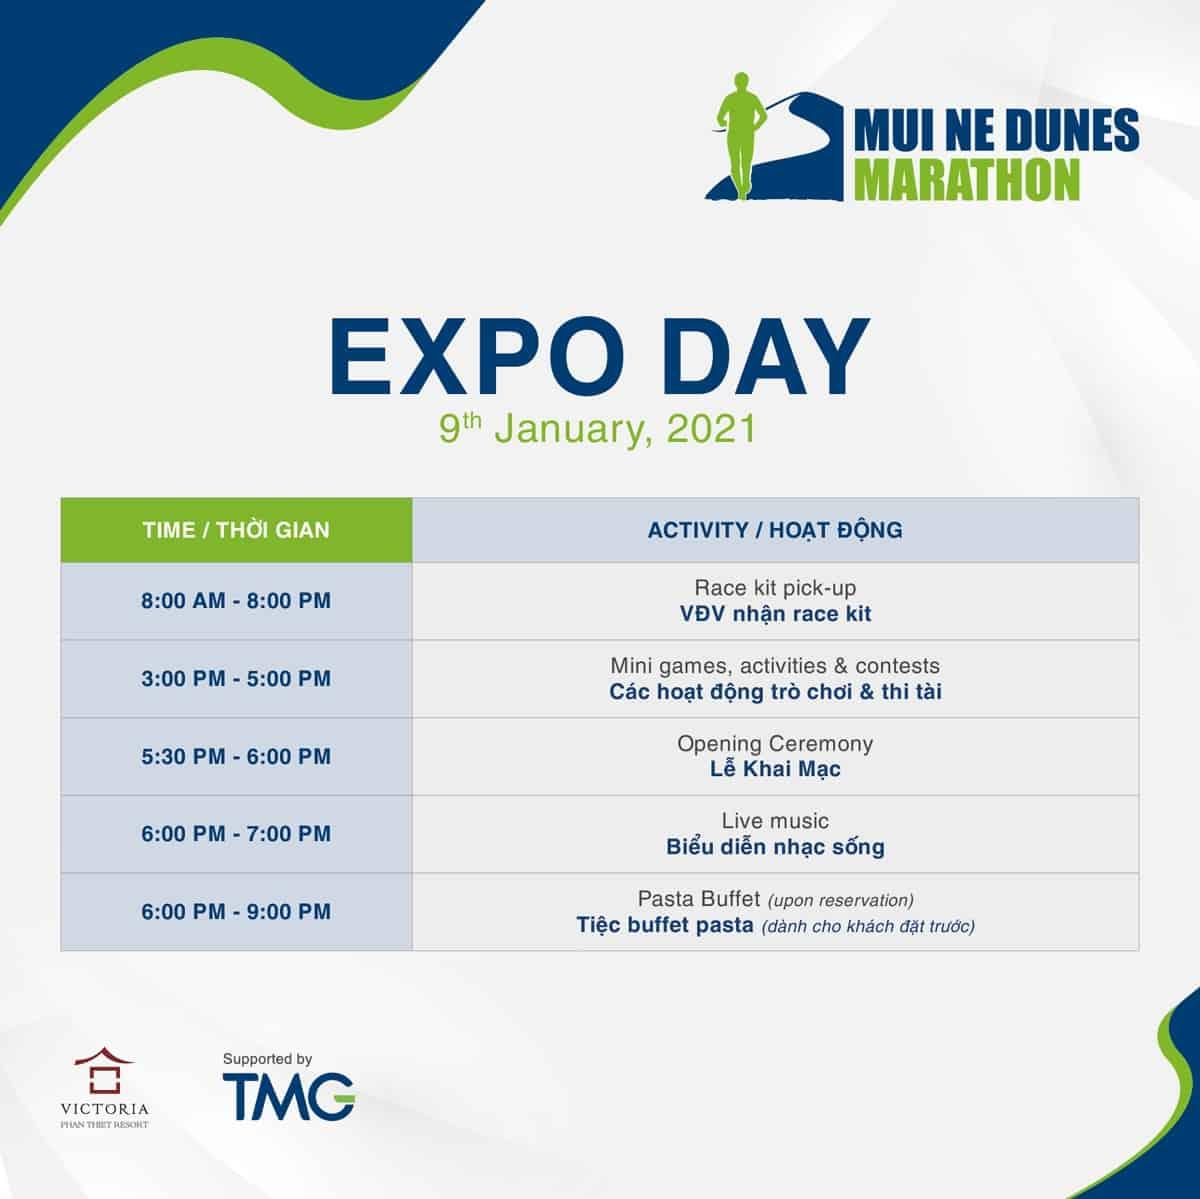 Expo Day của Mui Ne Dunes Marathon